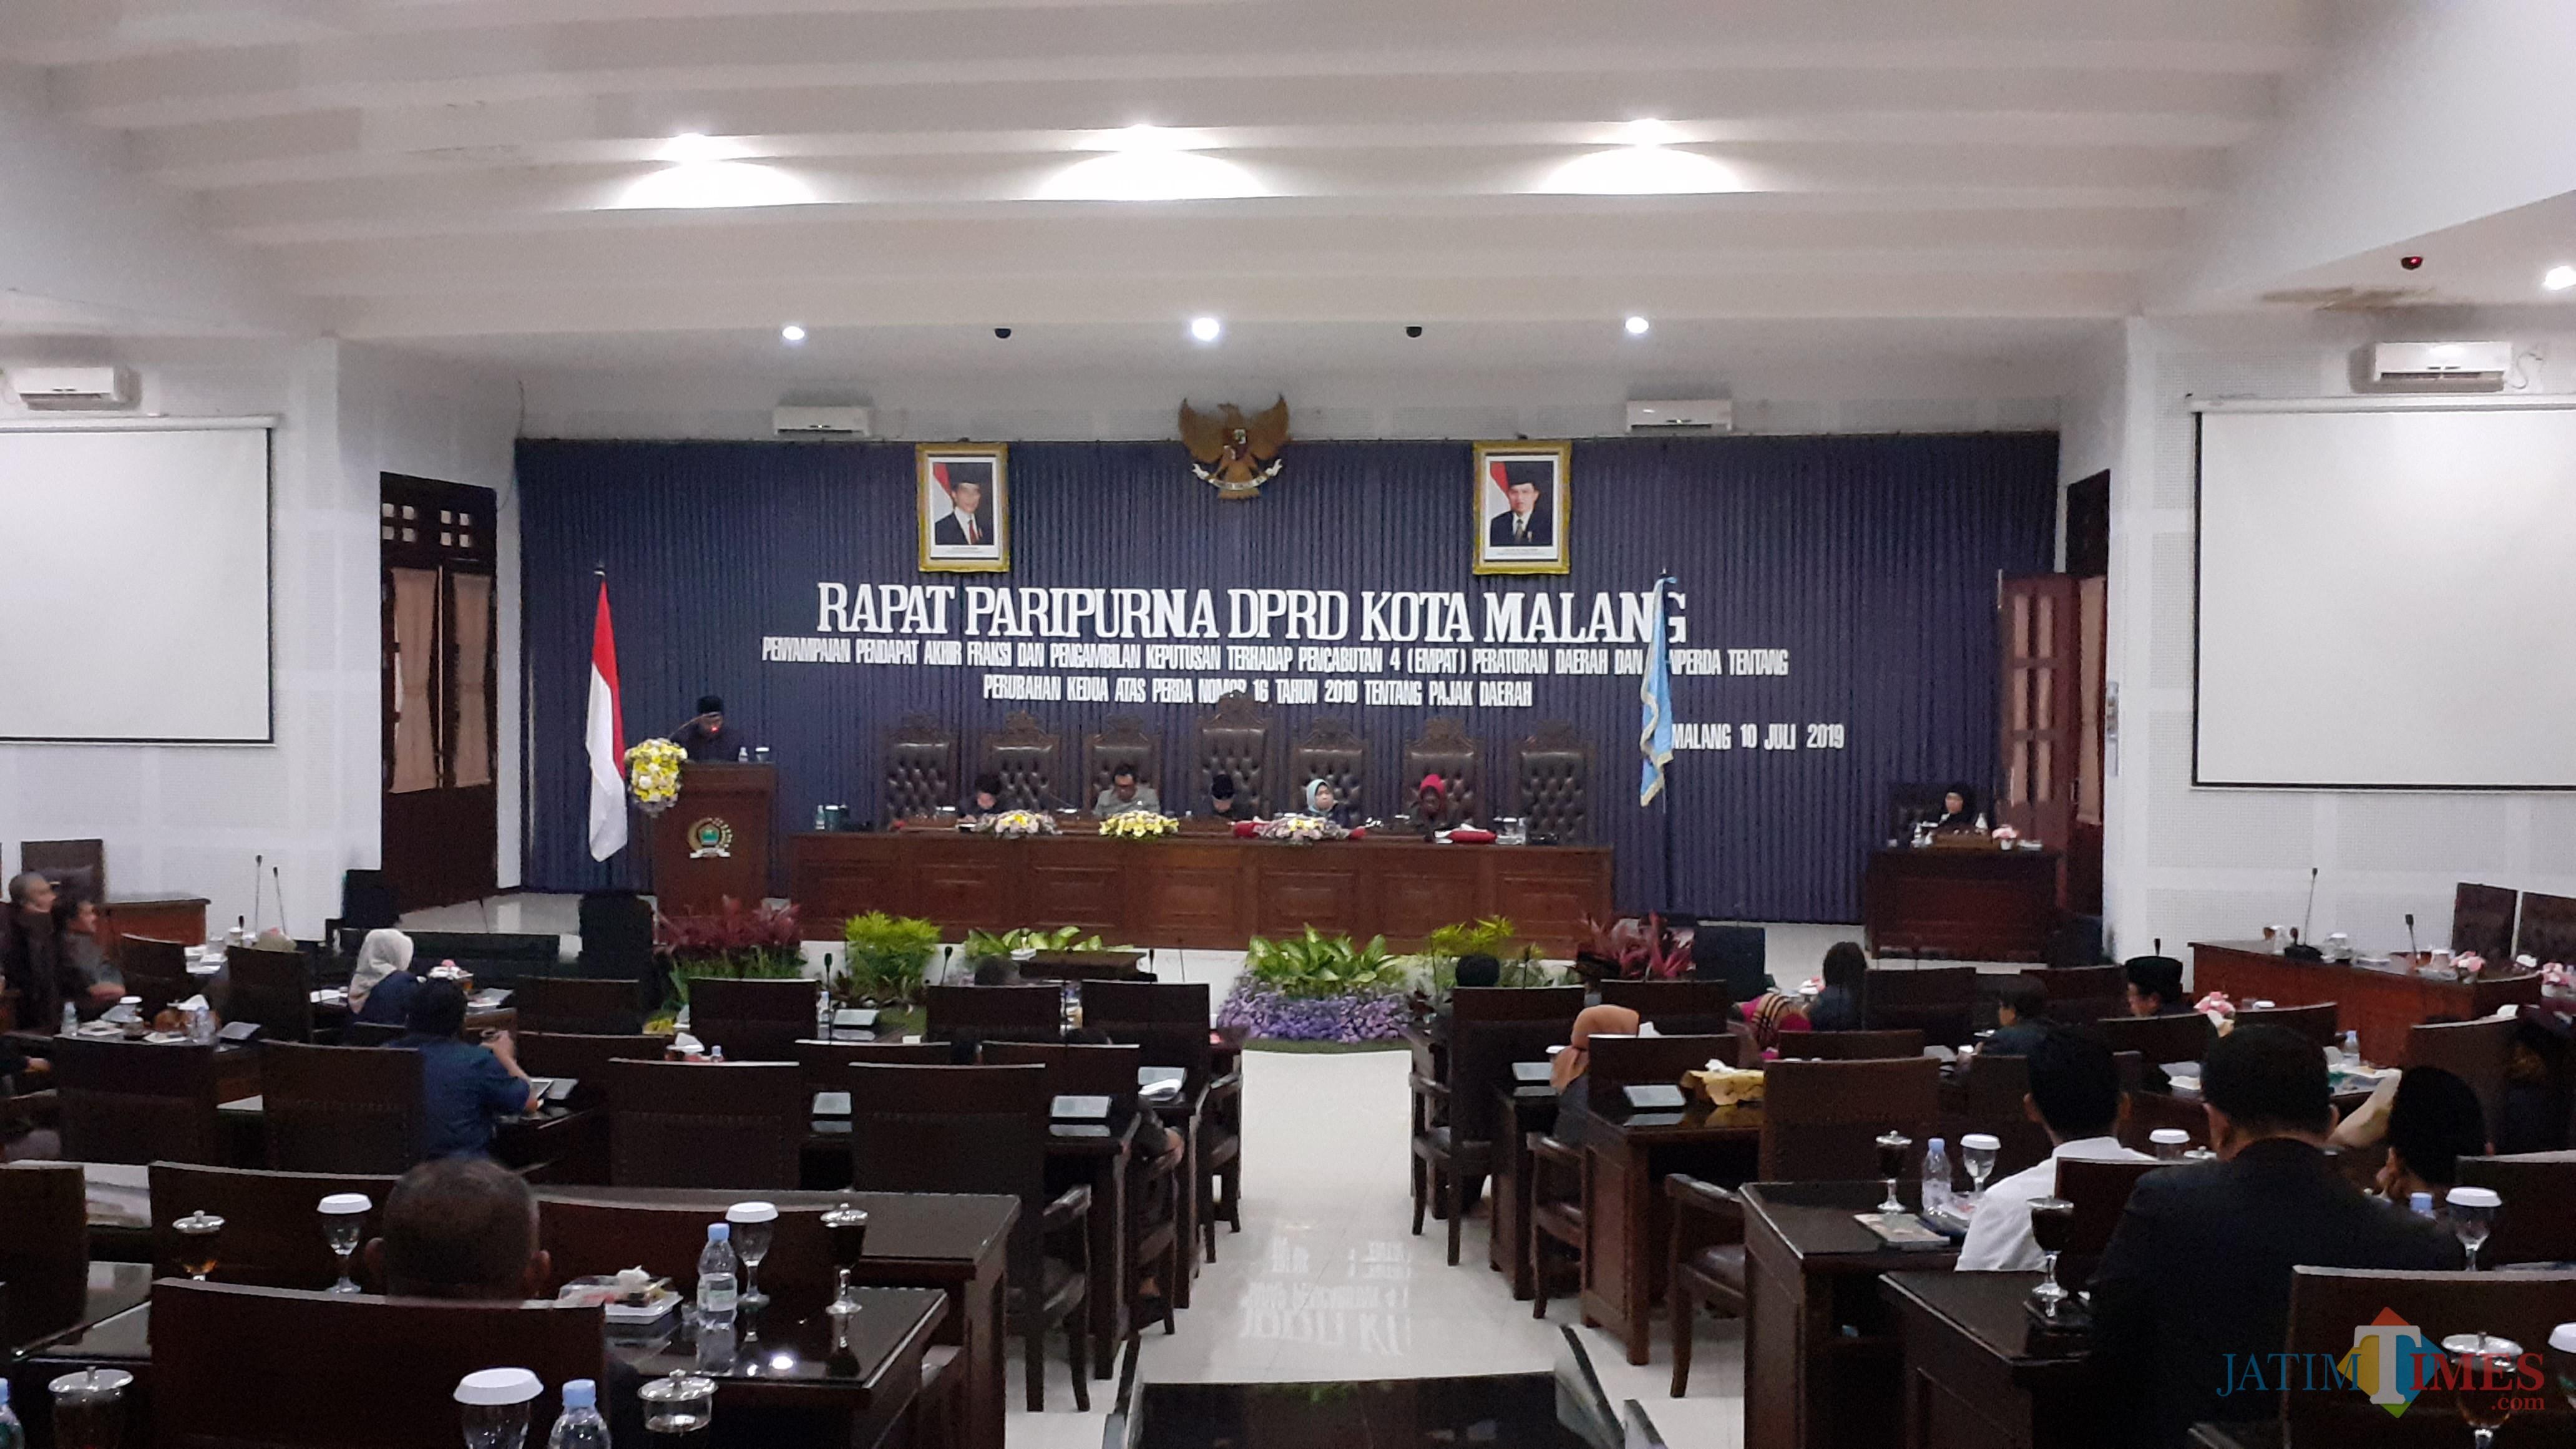 Sidang Paripurna DPRD Kota Malang (Ilustrasi/Pipit Anggraeni/MalangTIMES).